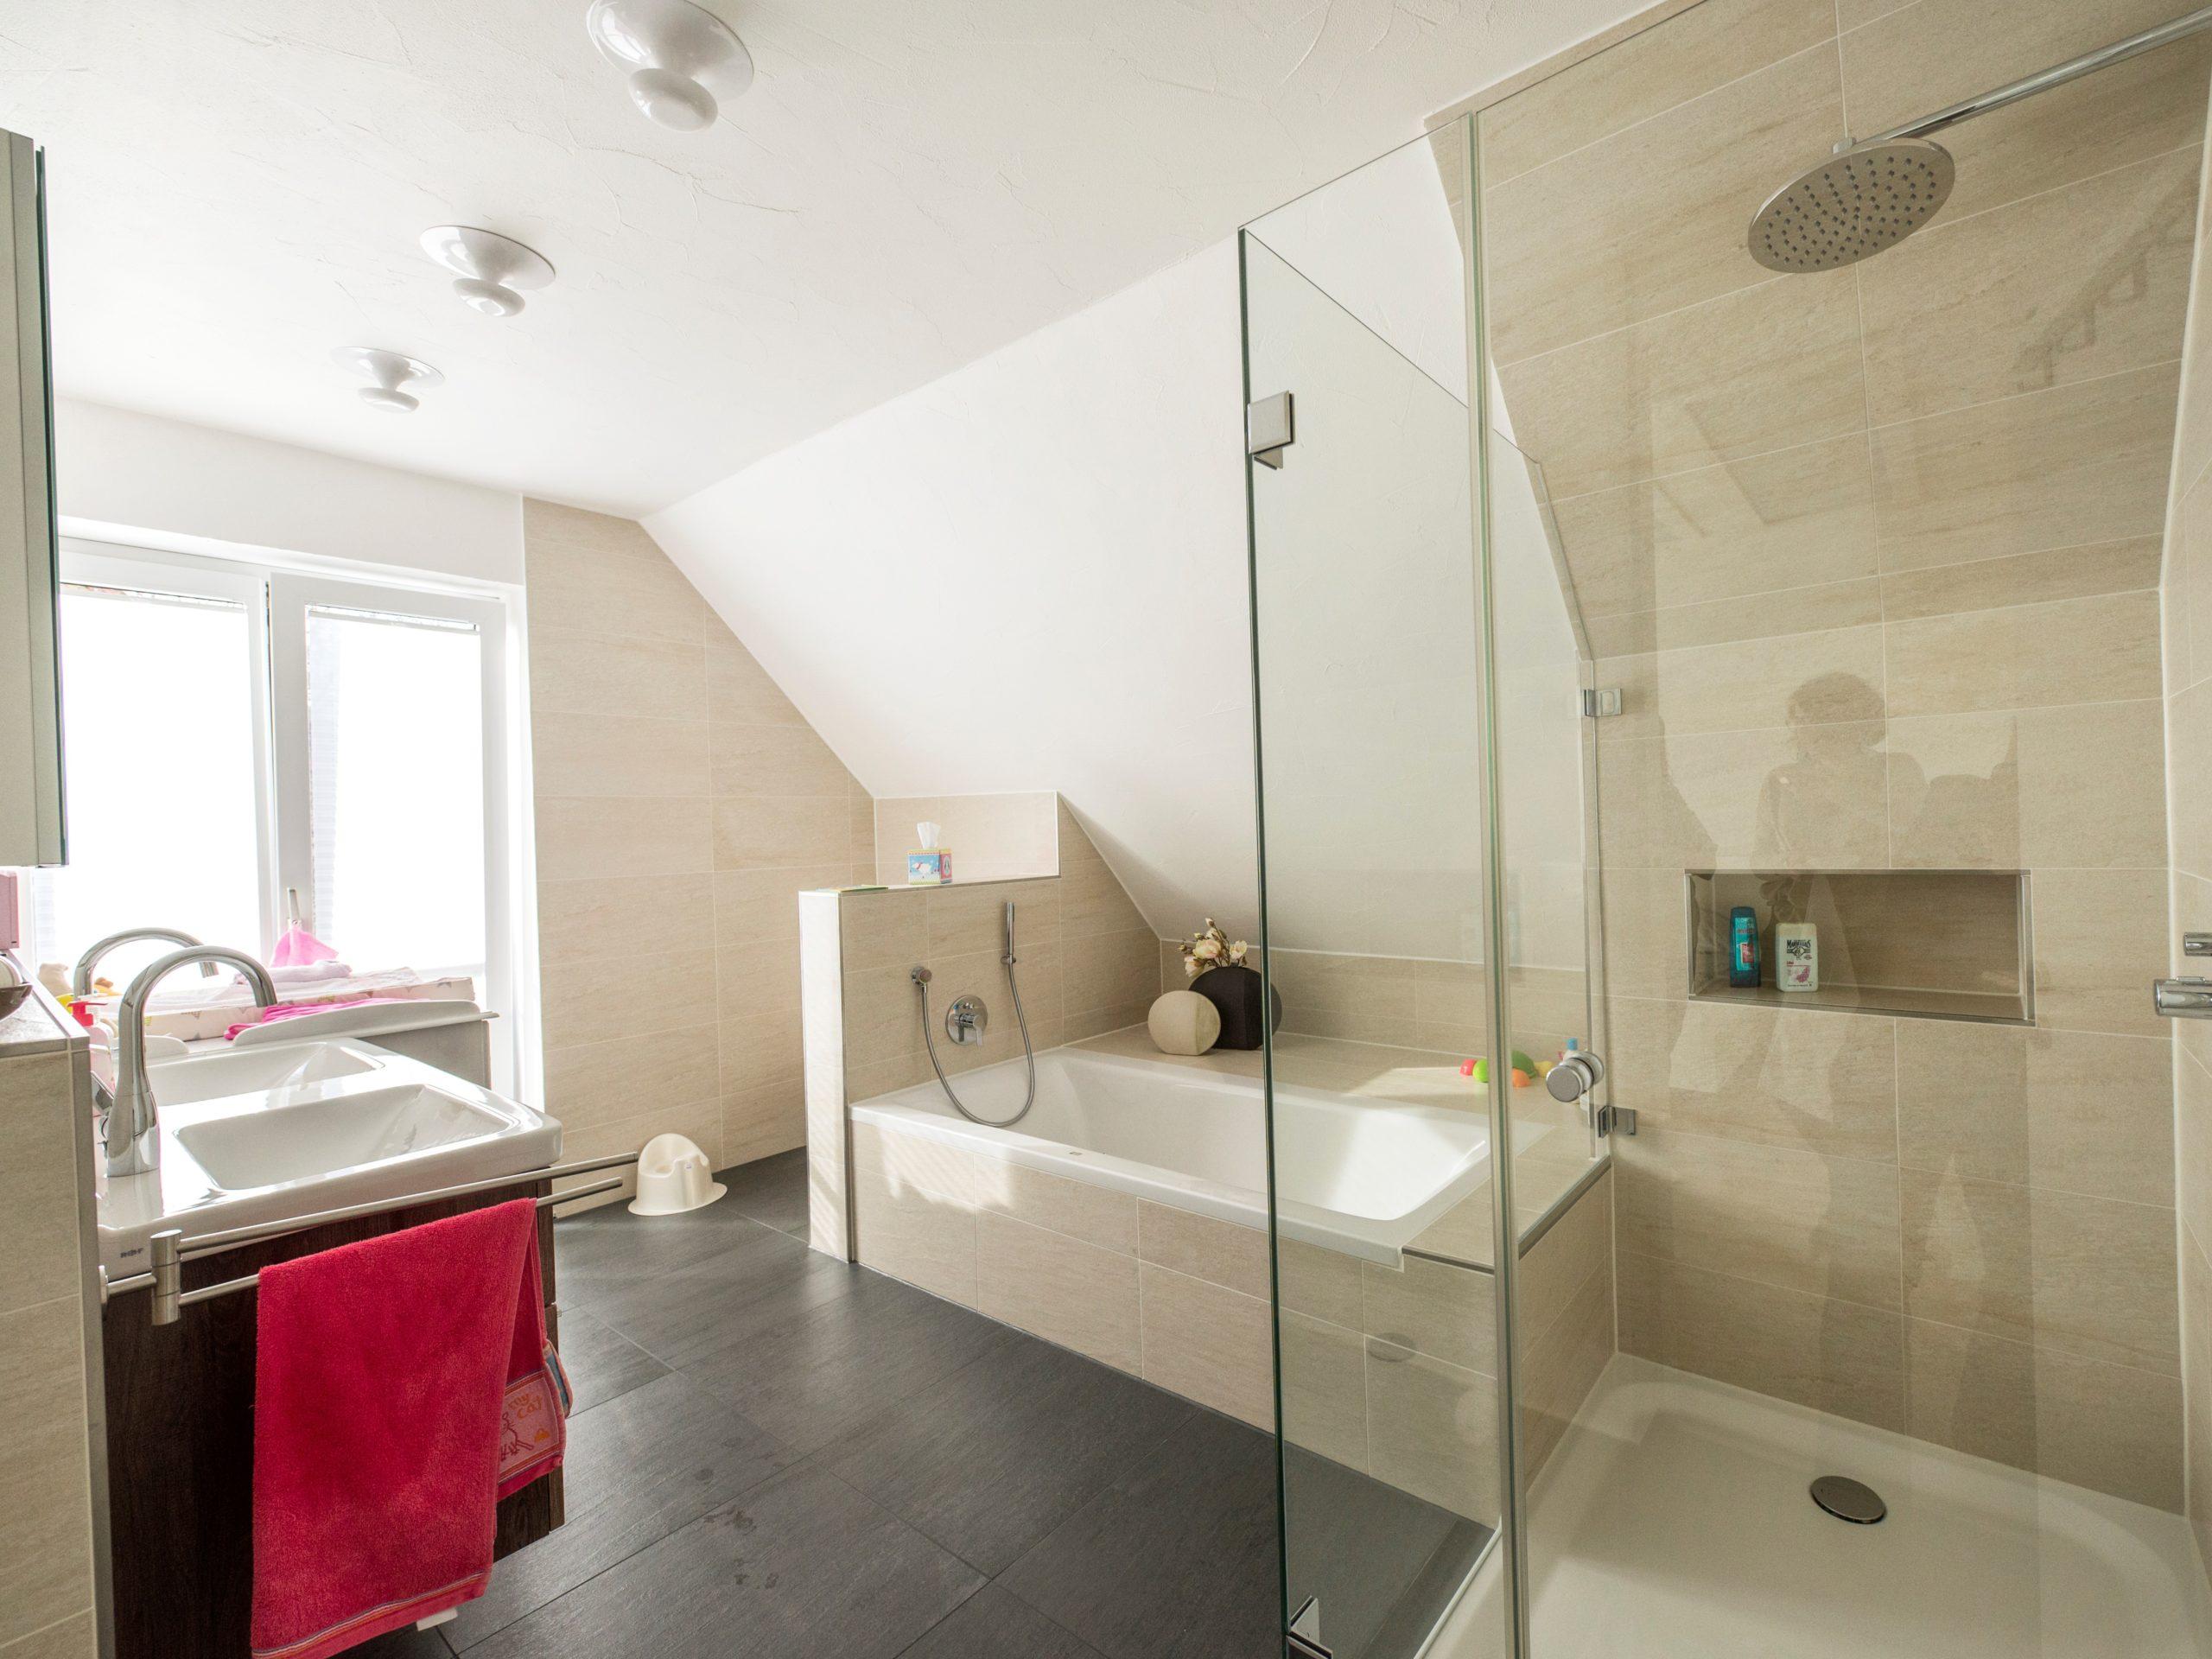 Badezimmer-Raumgestaltung